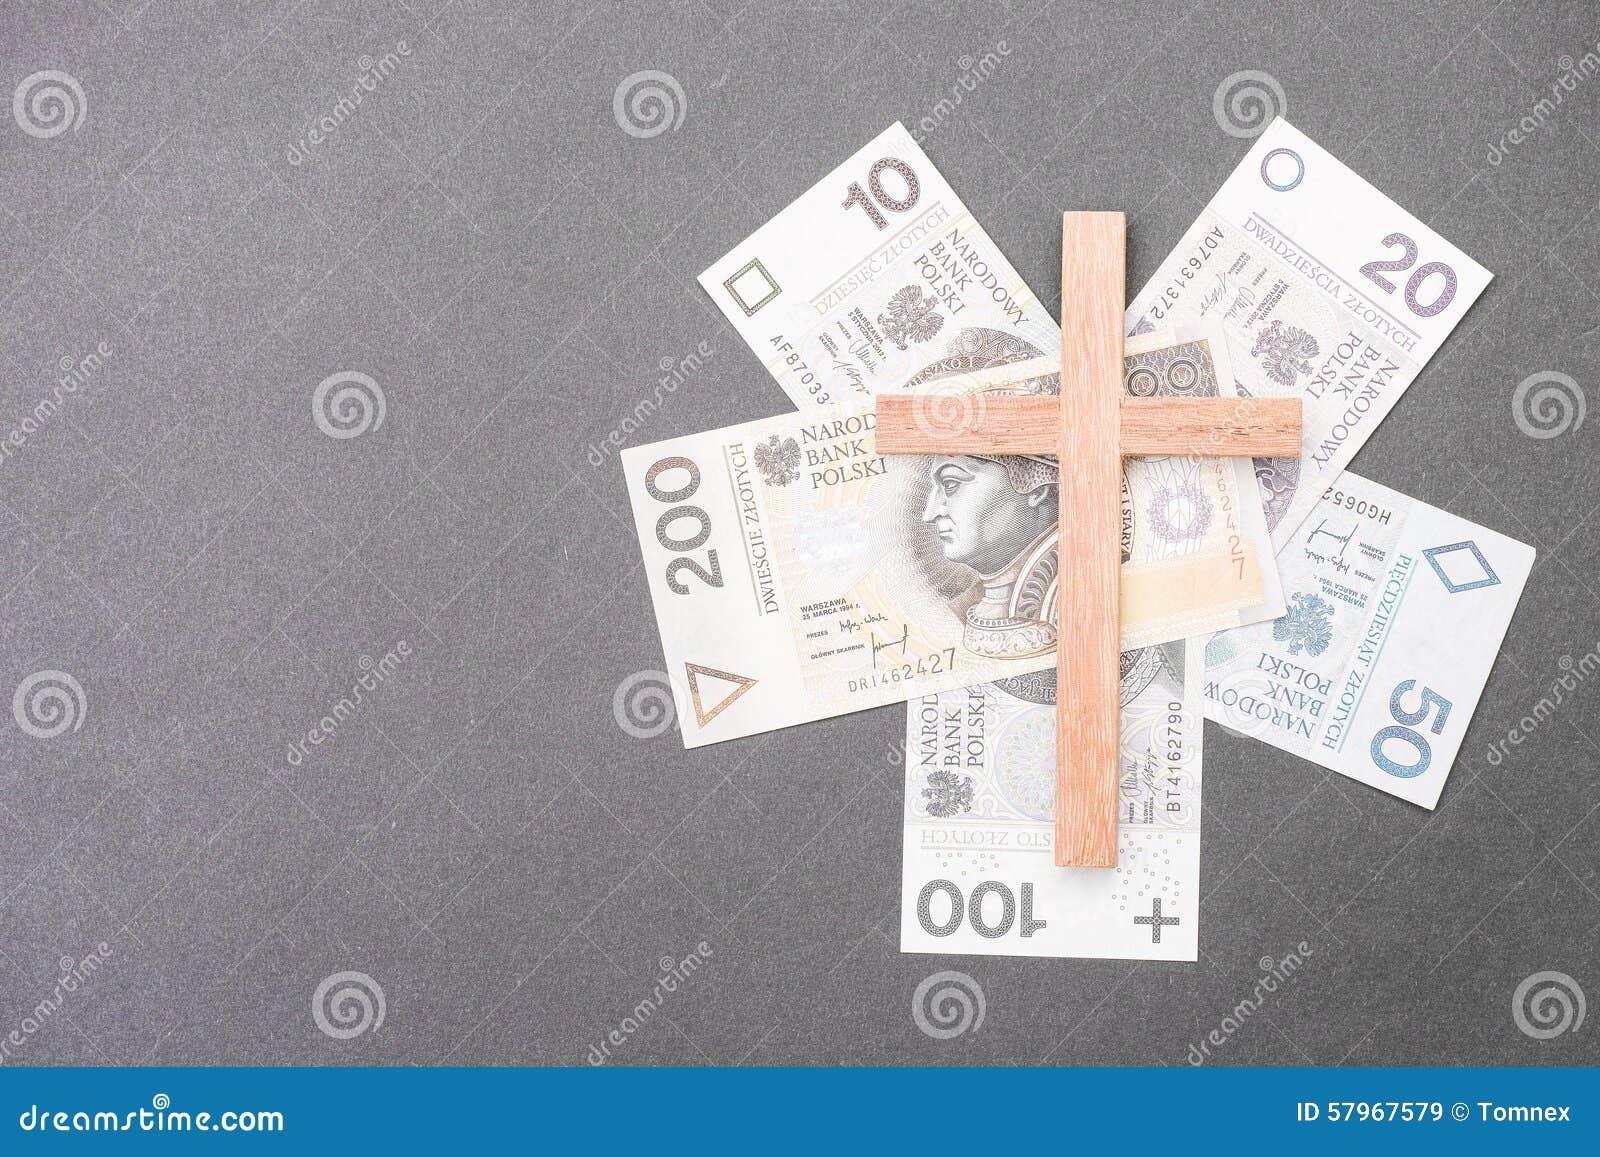 Polish Church Money Stock Image Image Of Belief Banknotes 57967579